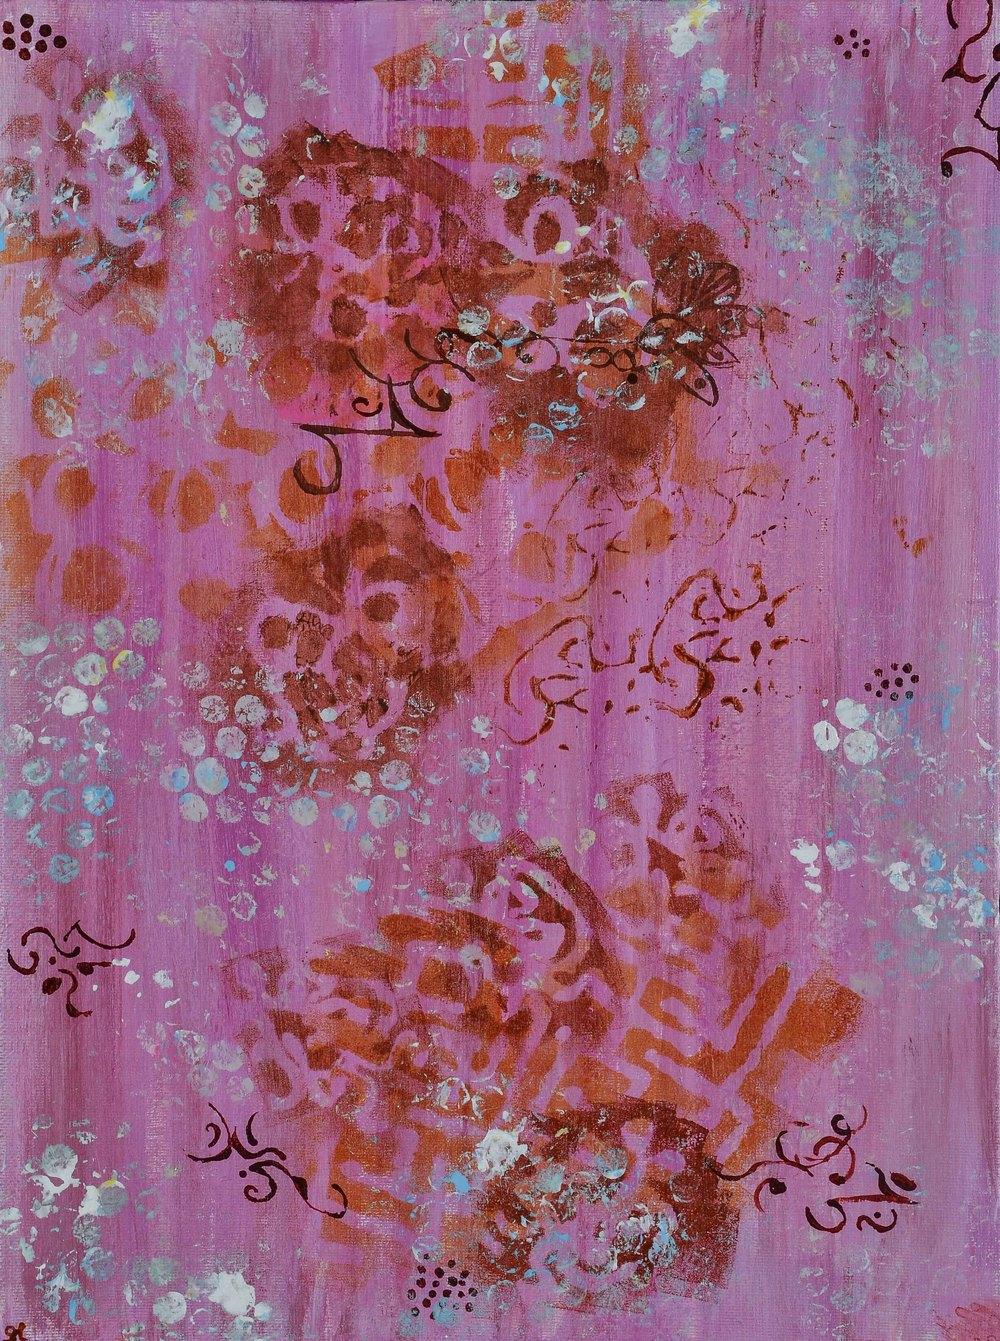 Lakshmi's Footprints